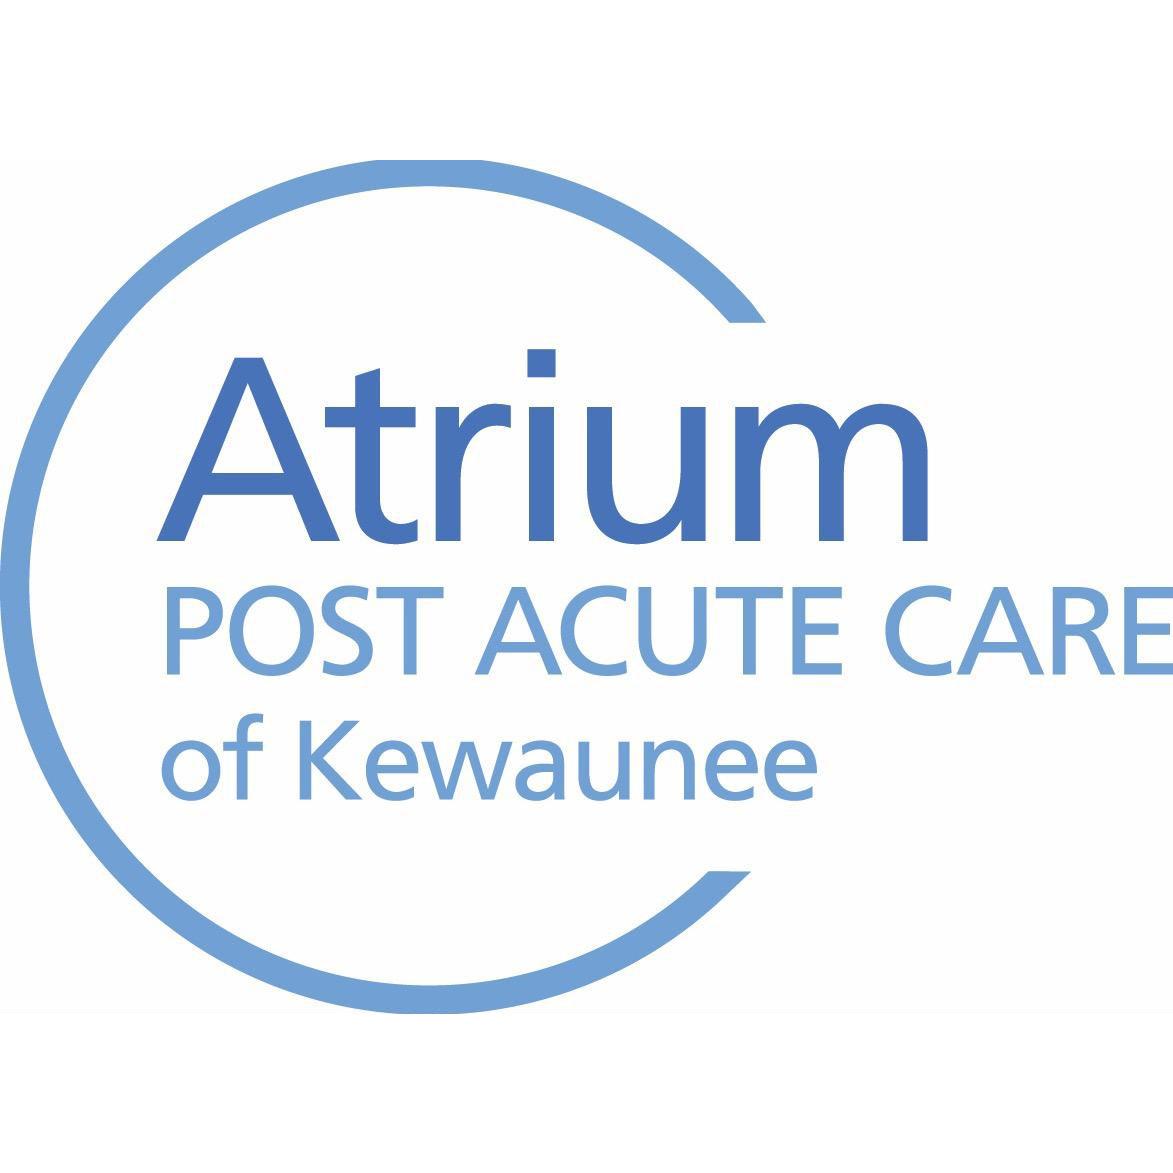 Atrium Post Acute Care of Kewaunee